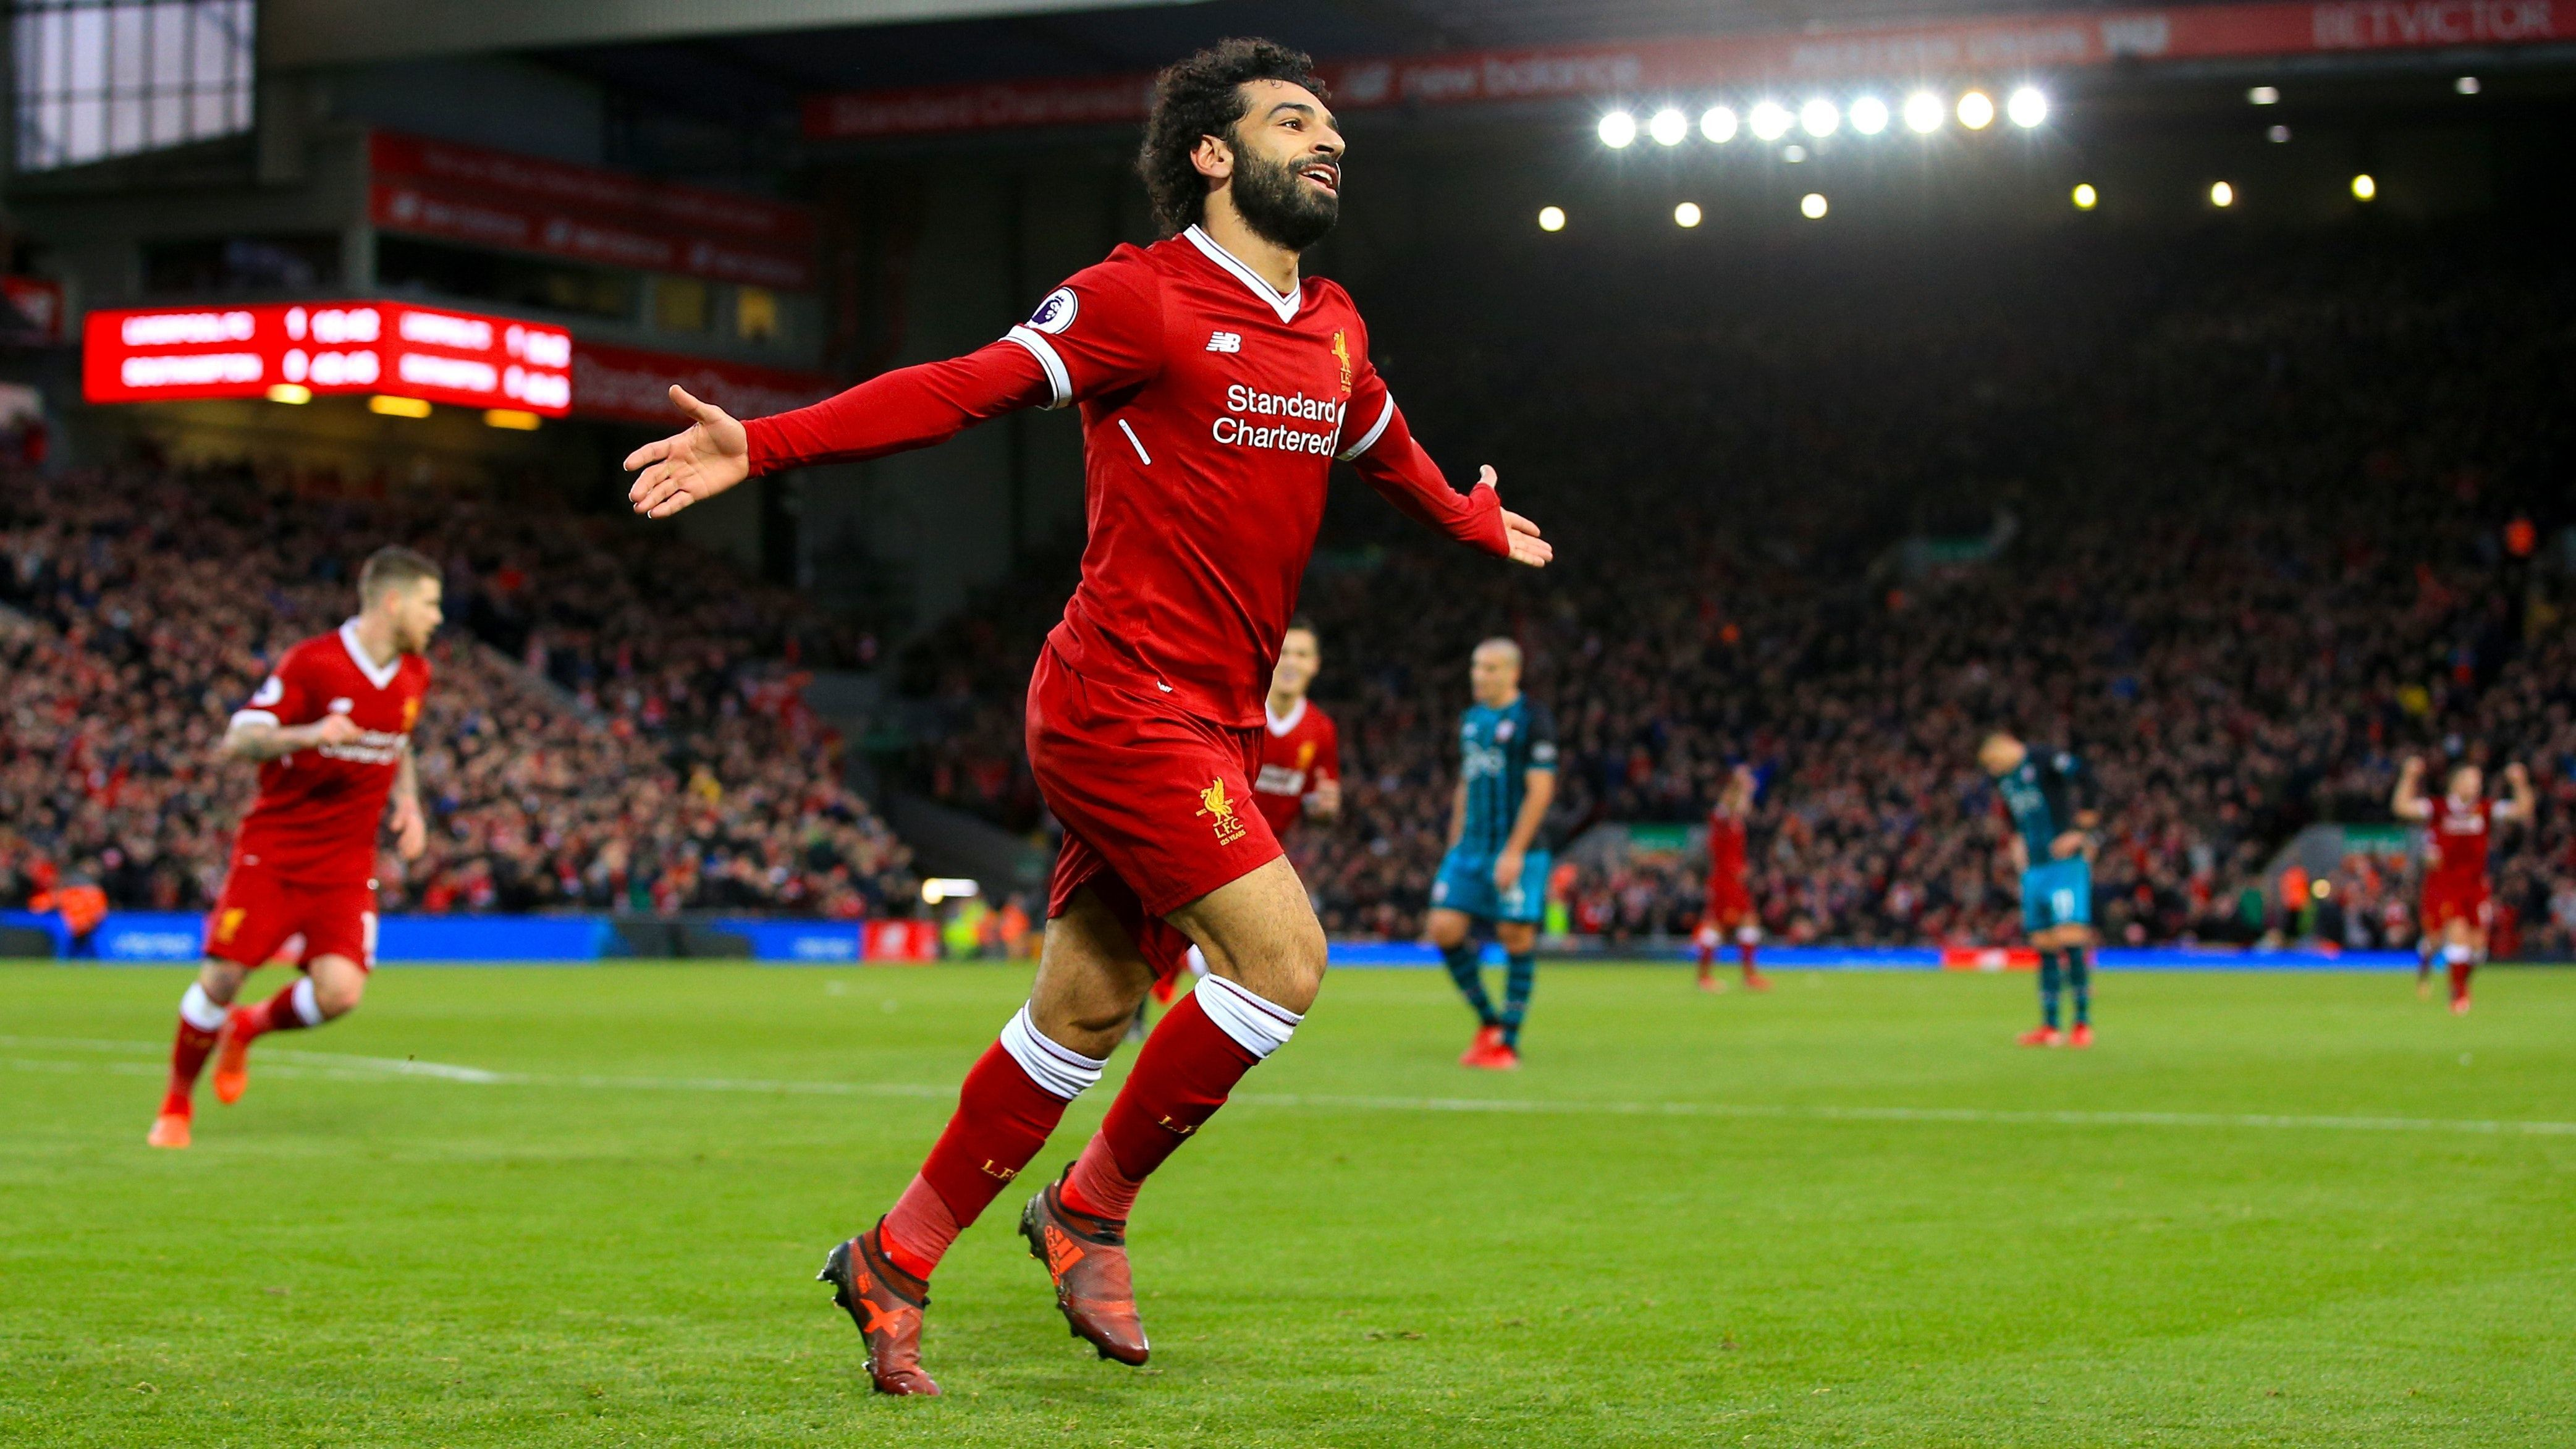 Mohamed salah 4k hd background   Download Liverpool FC Wallpaper   Mac Heat